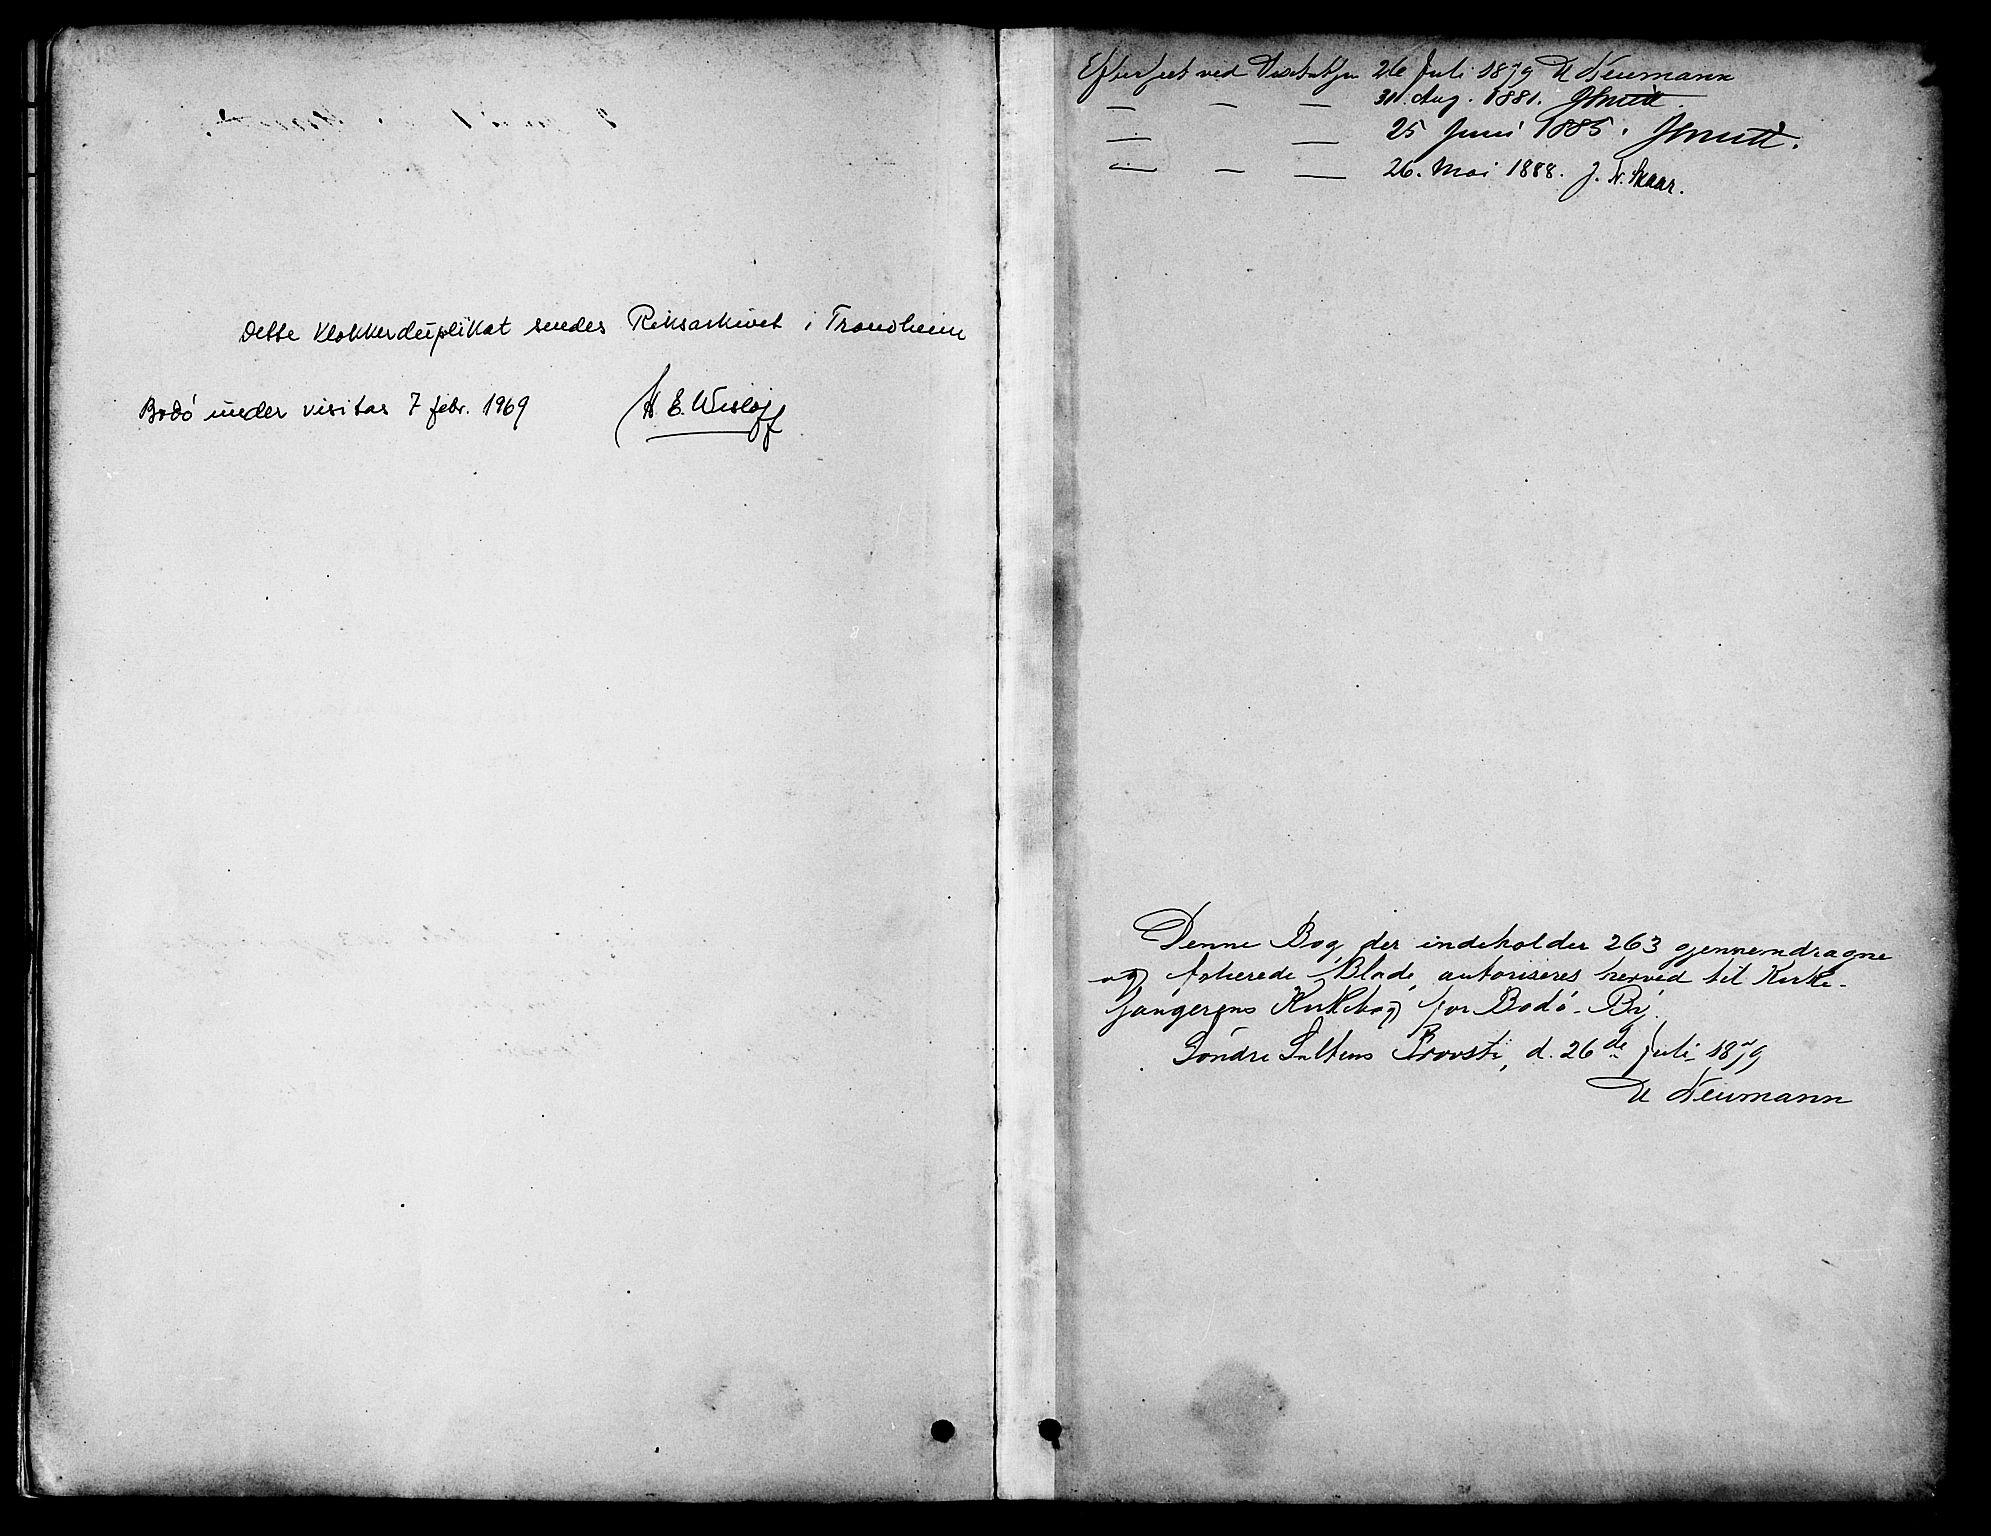 SAT, Ministerialprotokoller, klokkerbøker og fødselsregistre - Nordland, 801/L0030: Klokkerbok nr. 801C05, 1879-1887